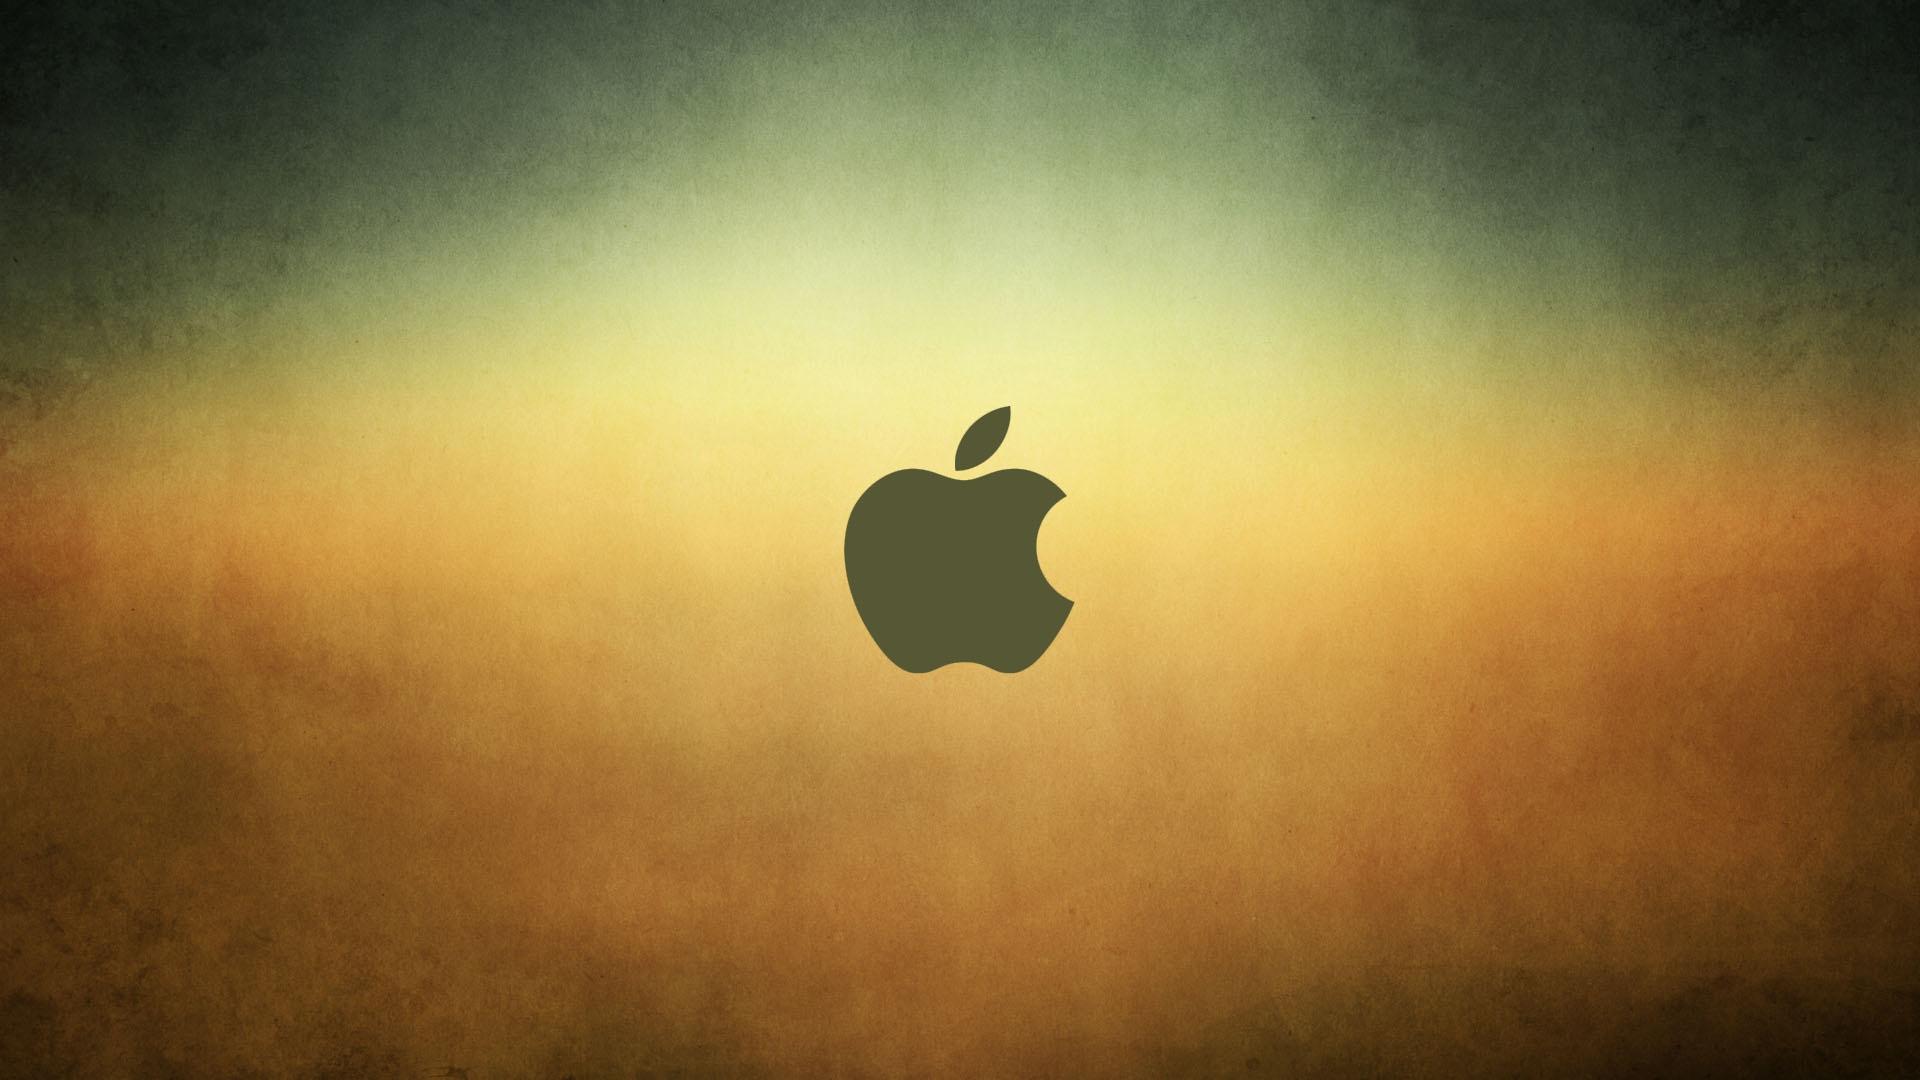 apple desktop wallpaper free download. hd leather apple backgrounds